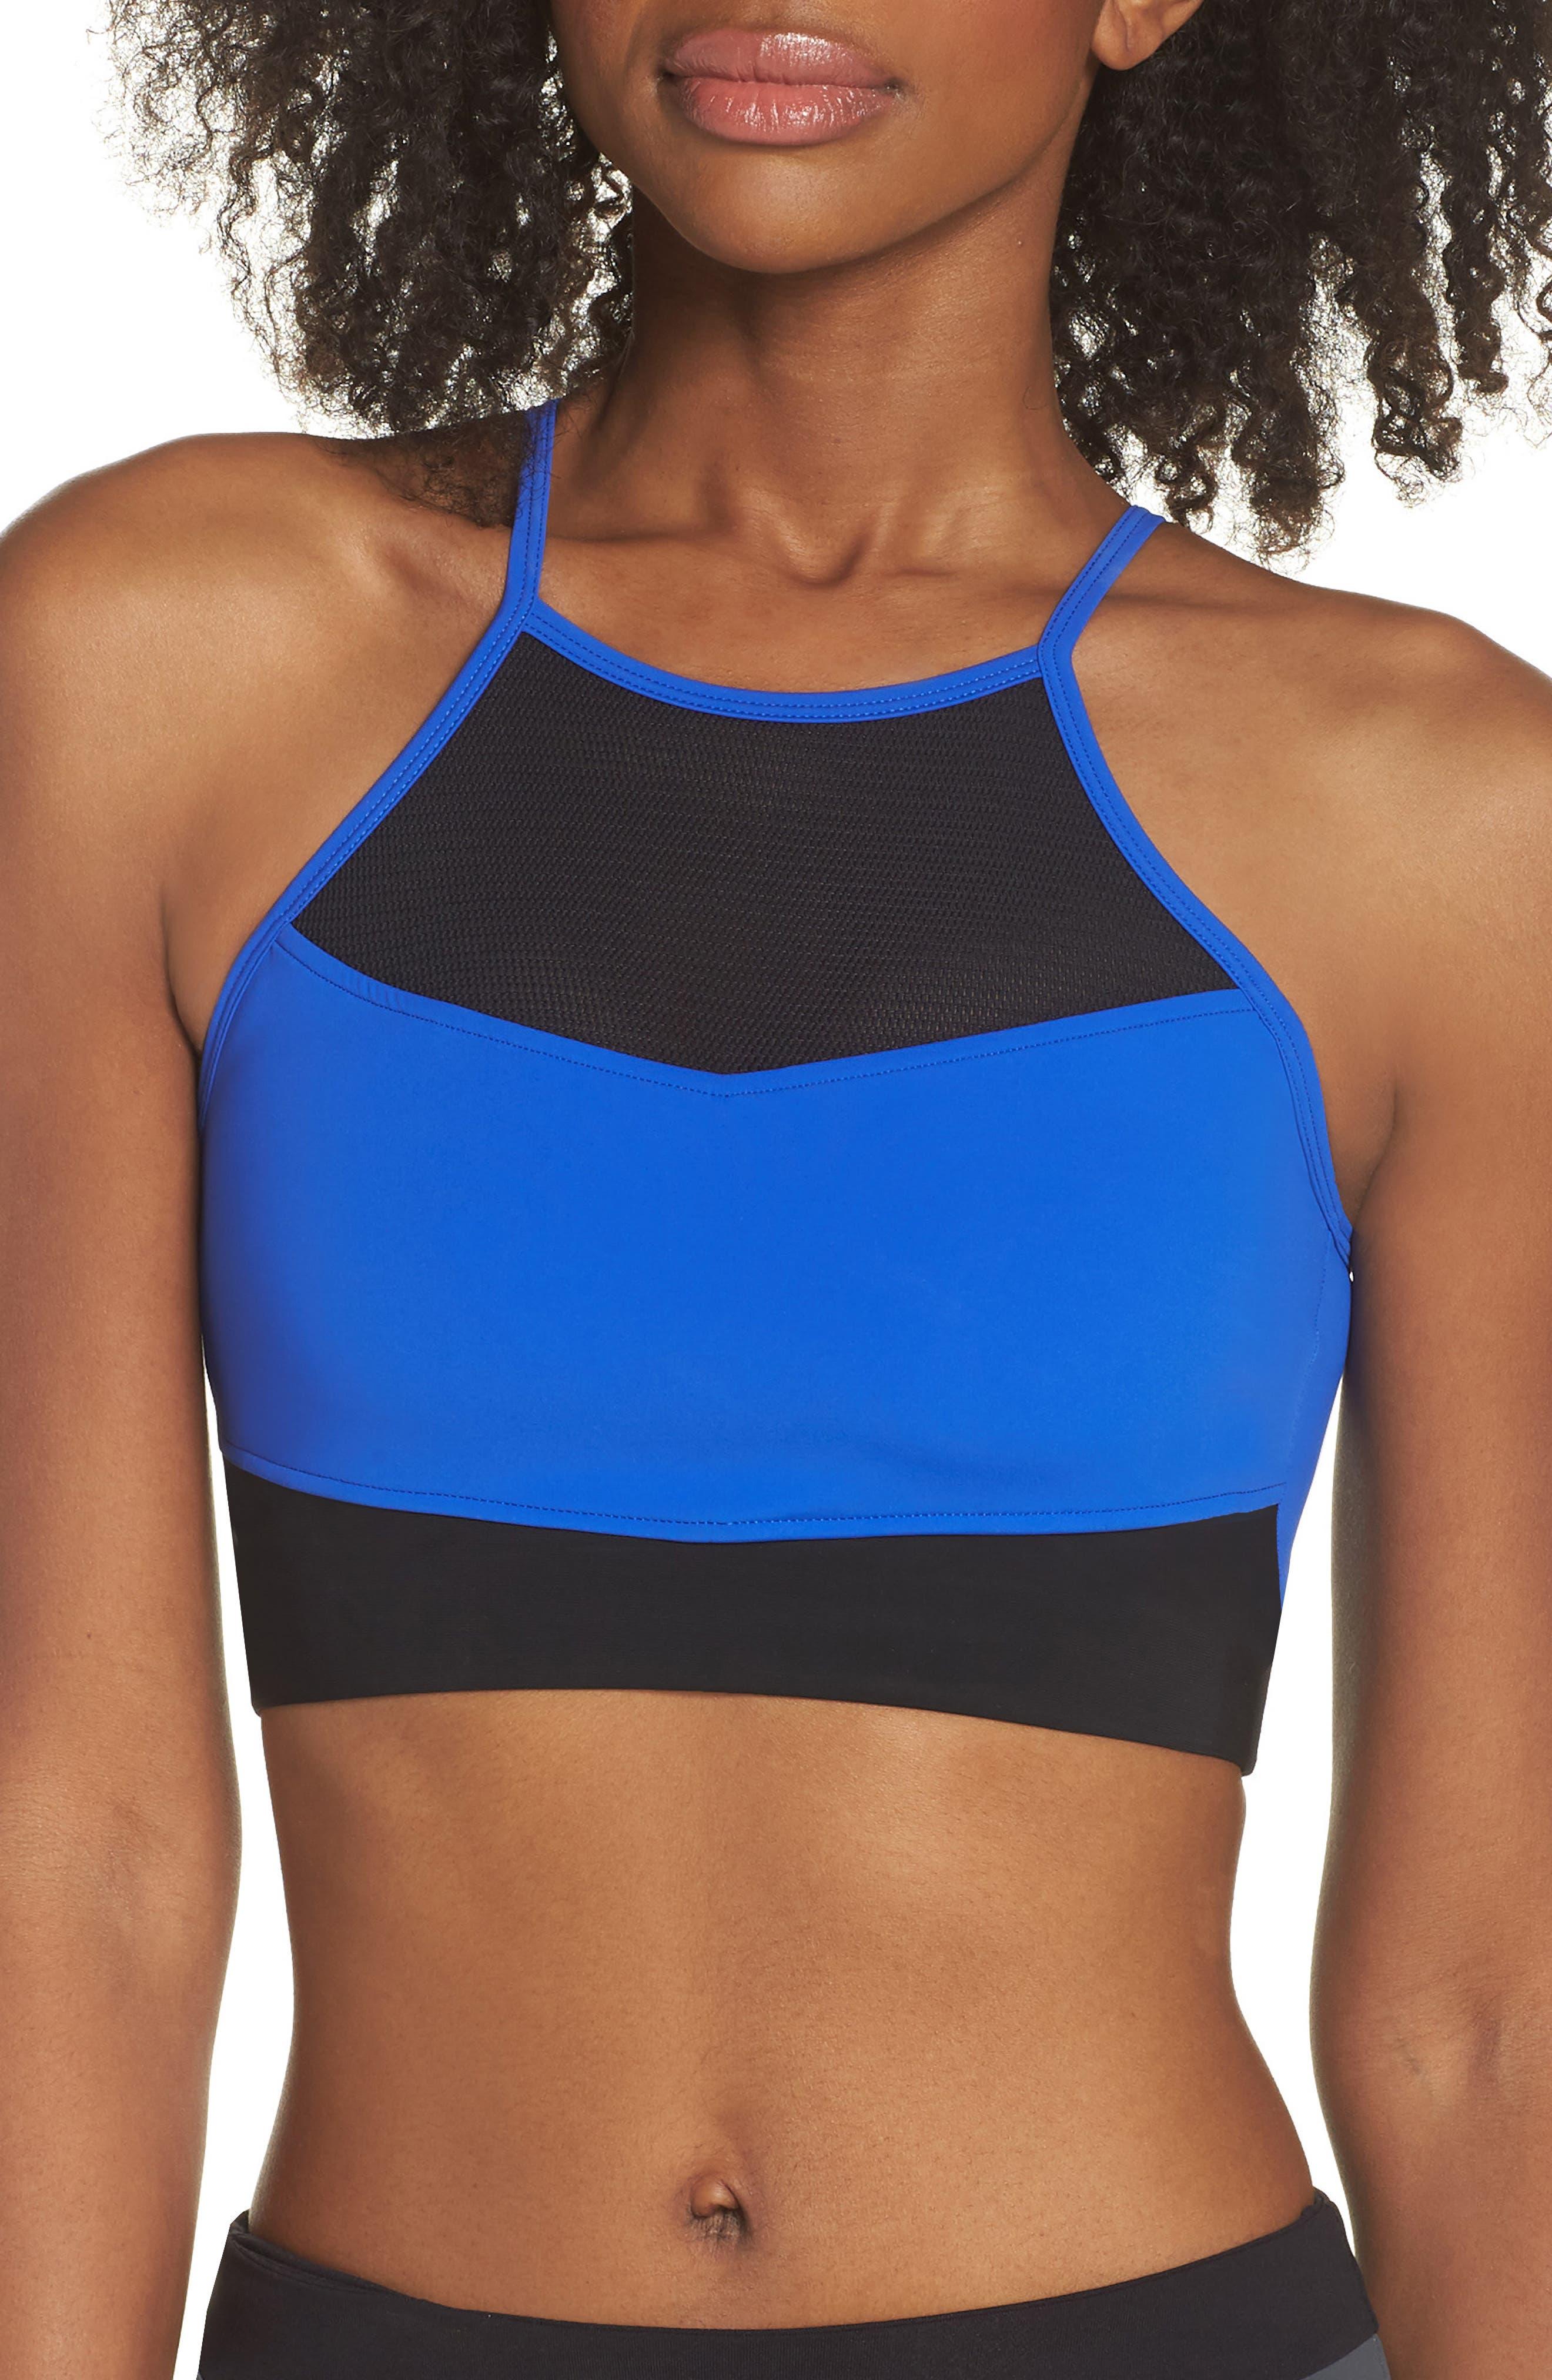 BoomBoom Athletica Cutaway Halter Bra,                             Main thumbnail 1, color,                             Electric Blue/ Black